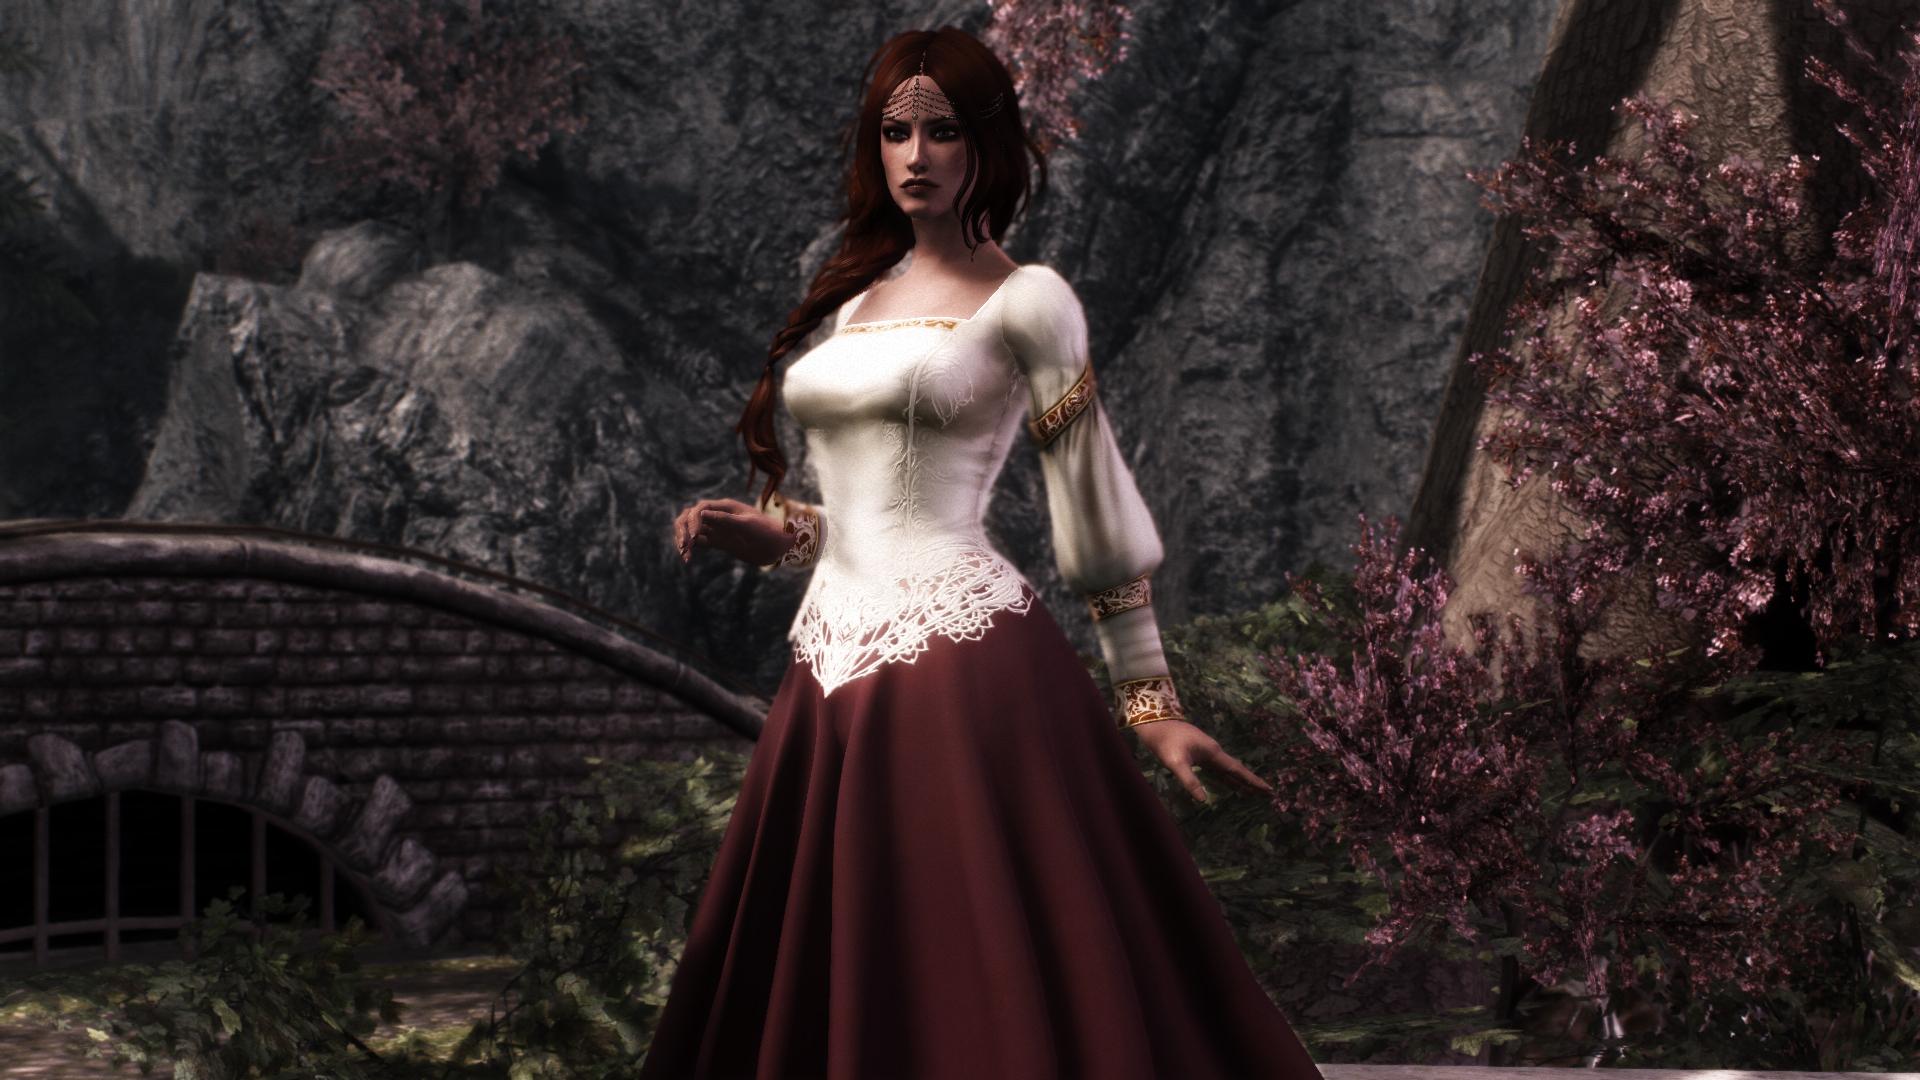 Skyrim Wedding Dress.Where To Buy A Wedding Dress In Skyrim Lixnet Ag